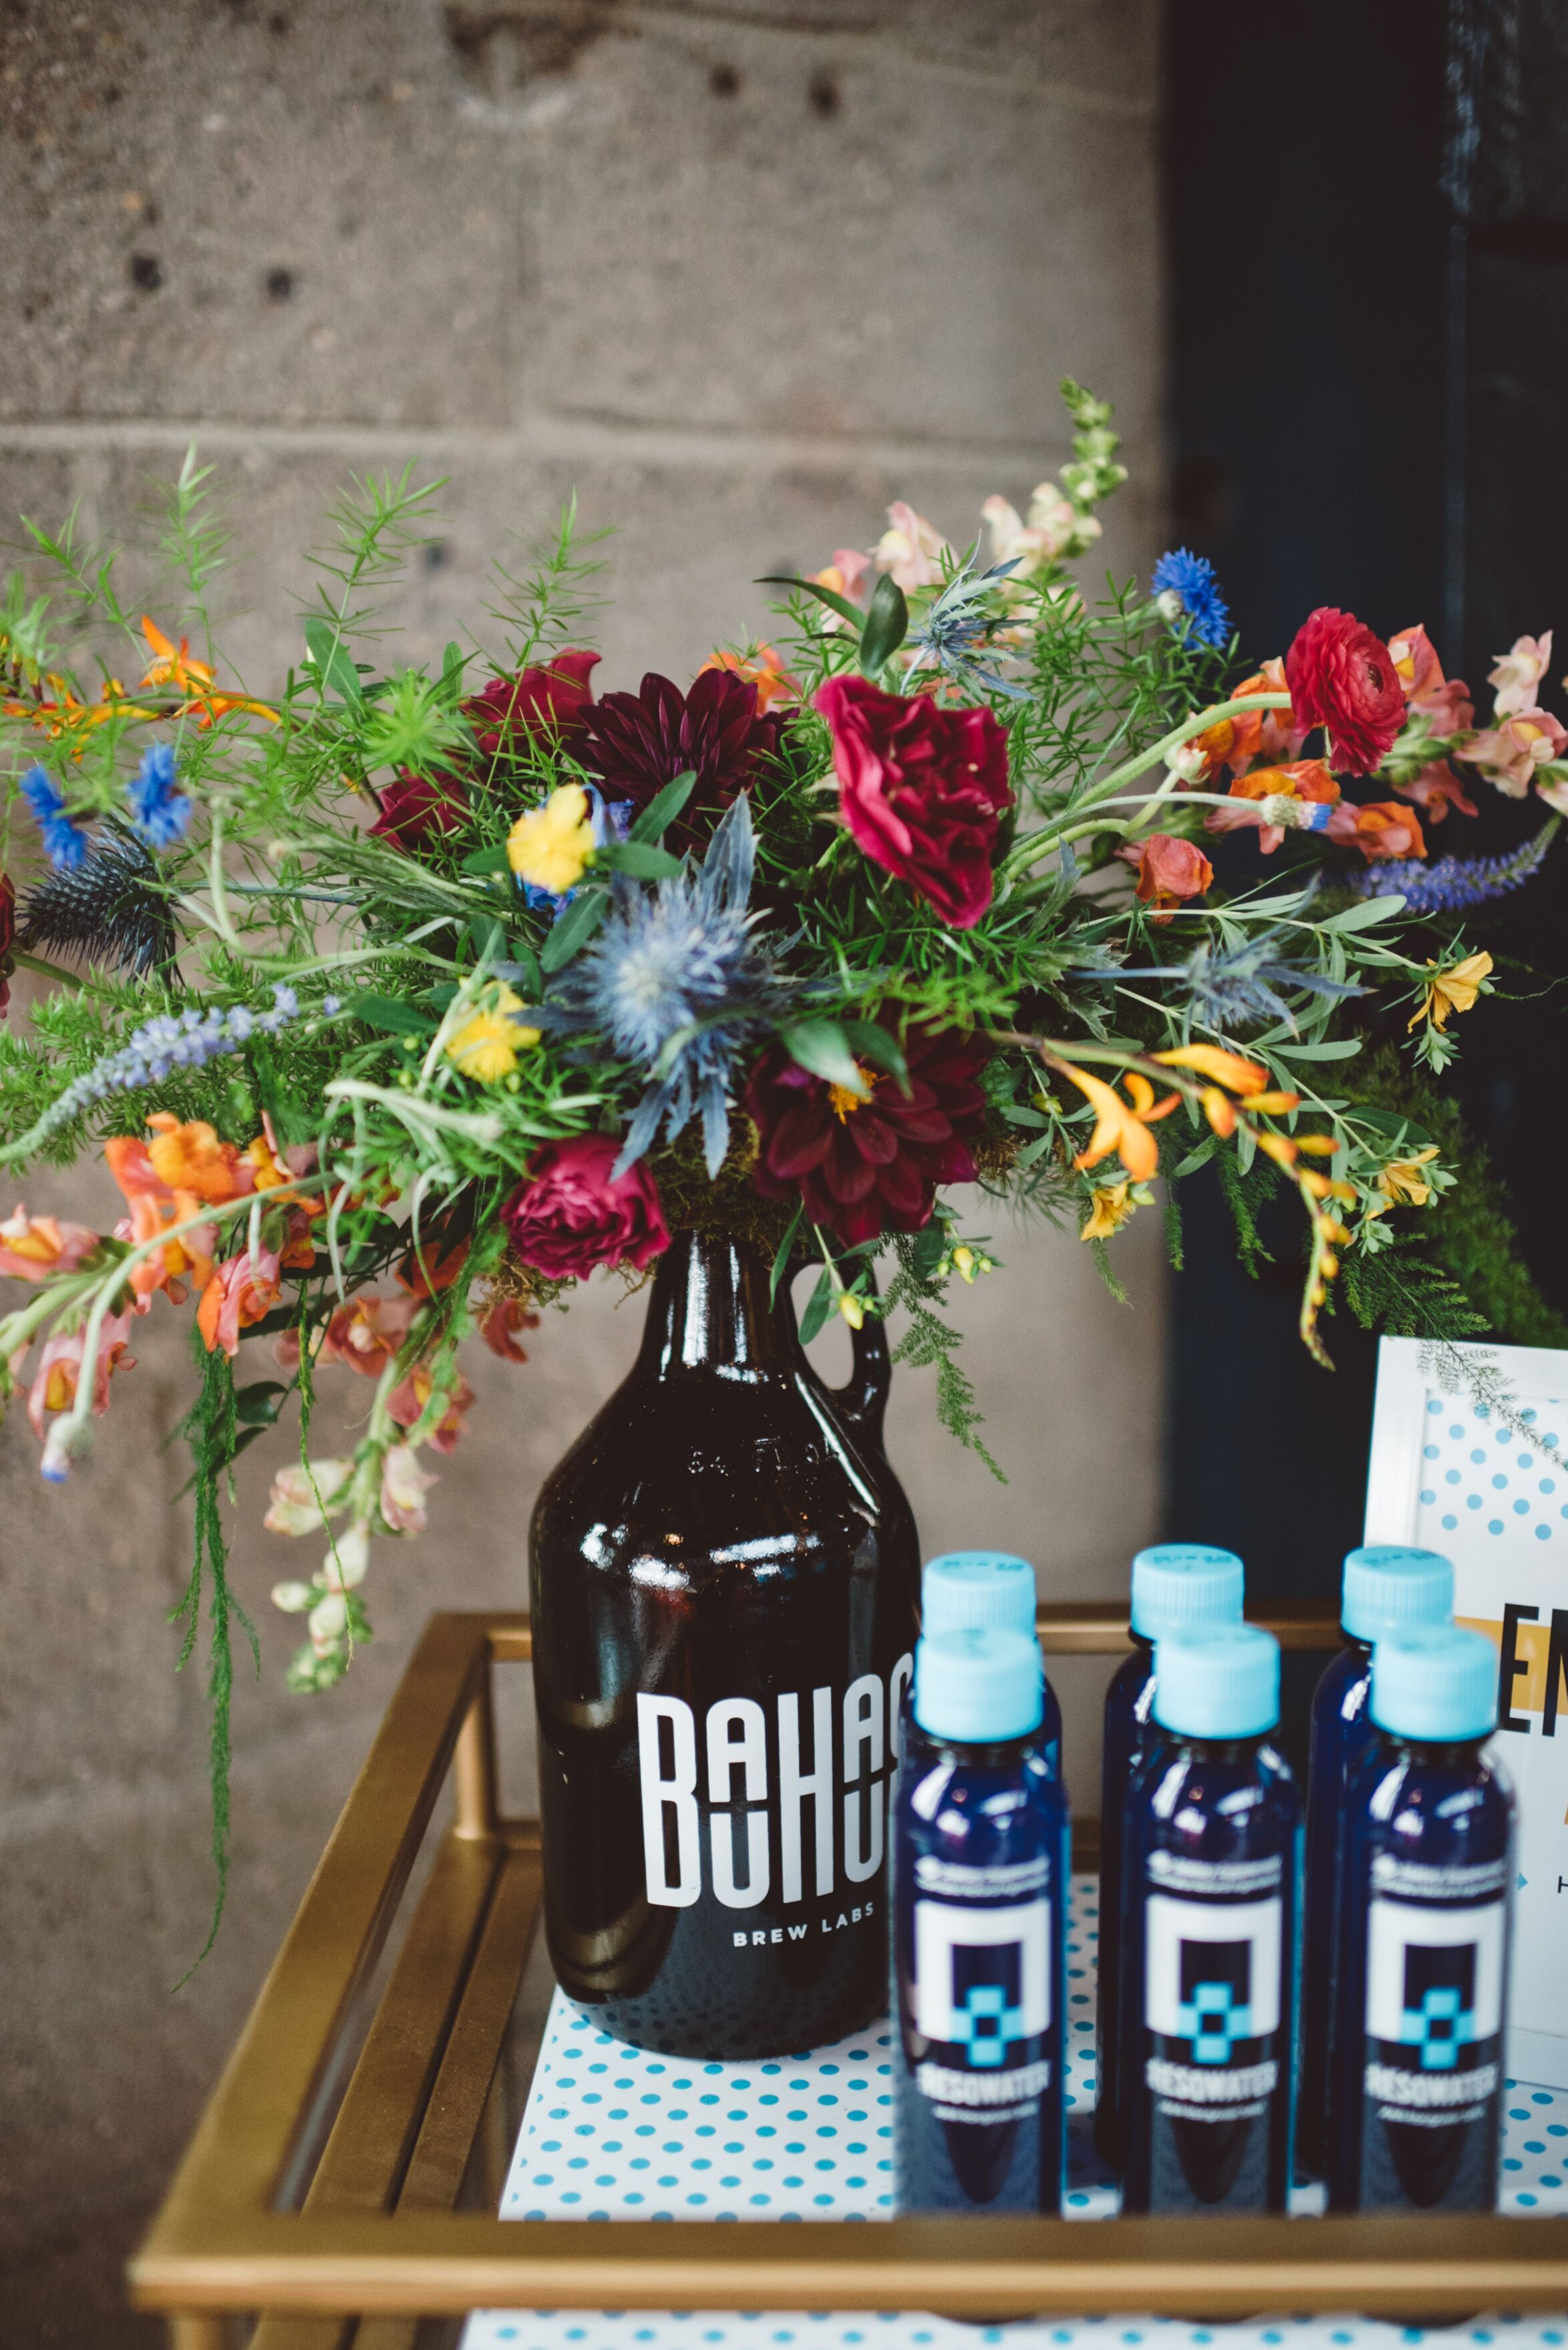 Wildflower Arrangements in Beer Growlers in 2020 Beer